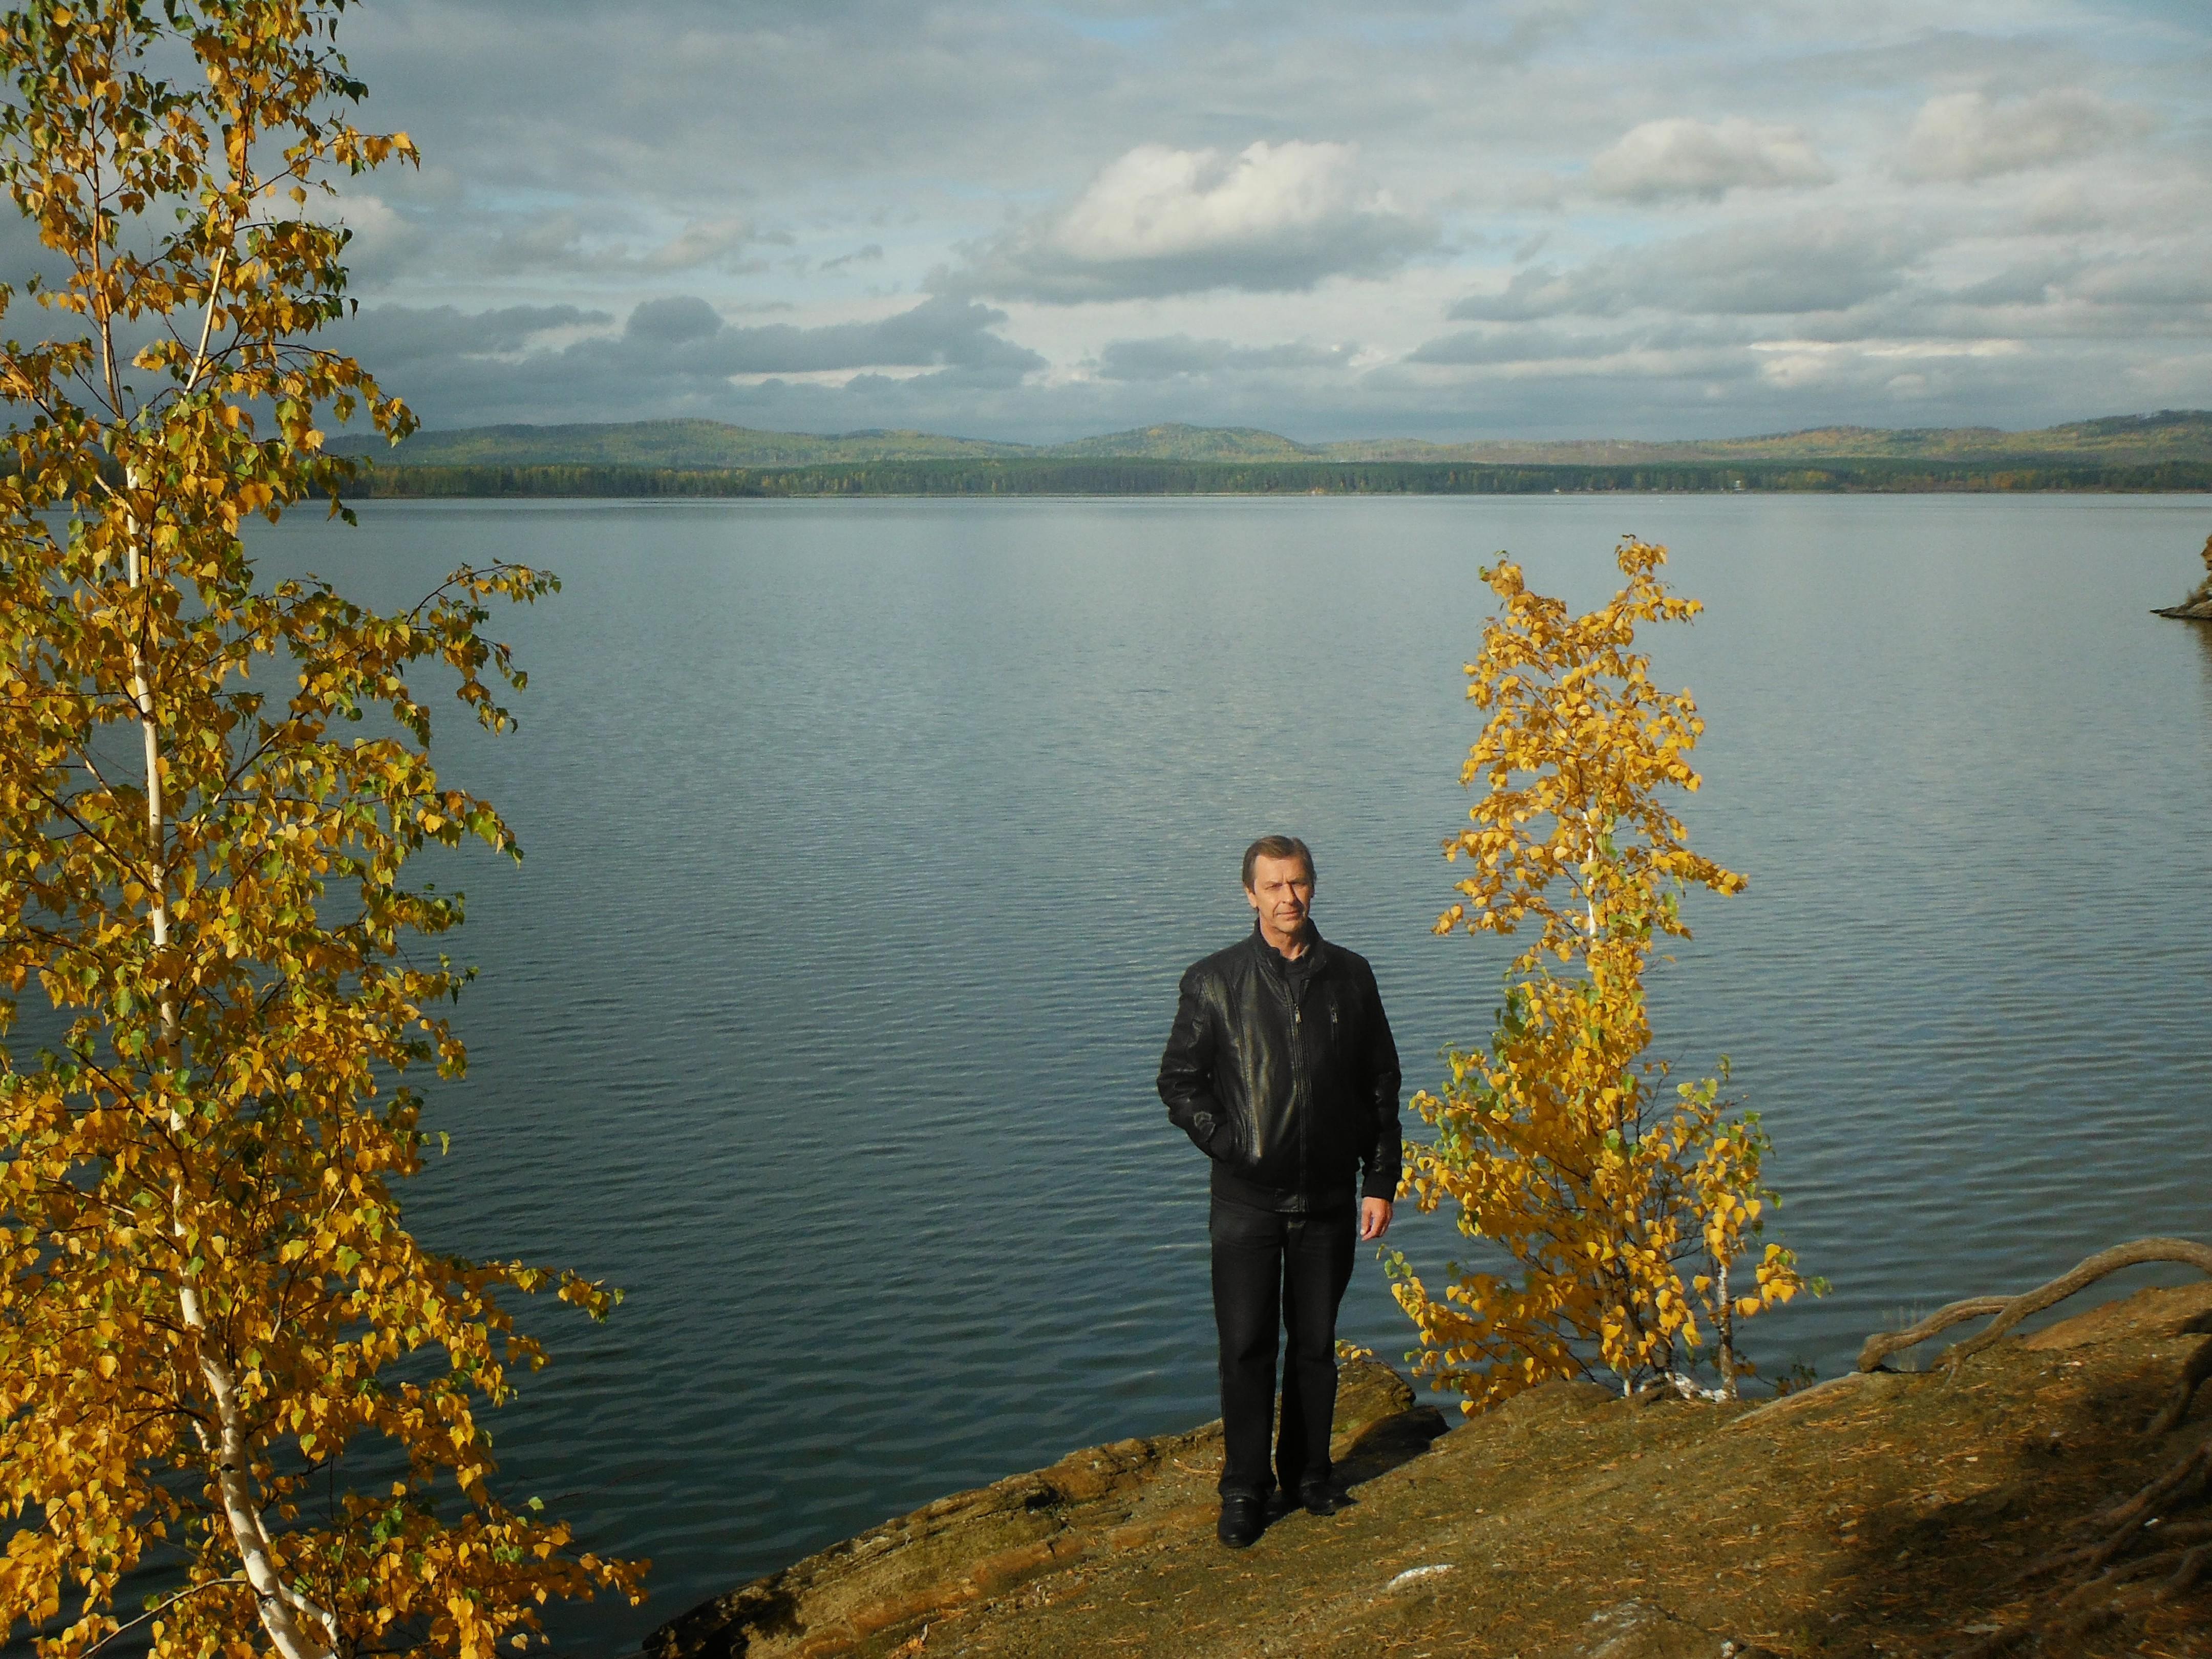 Sergey Ivliev